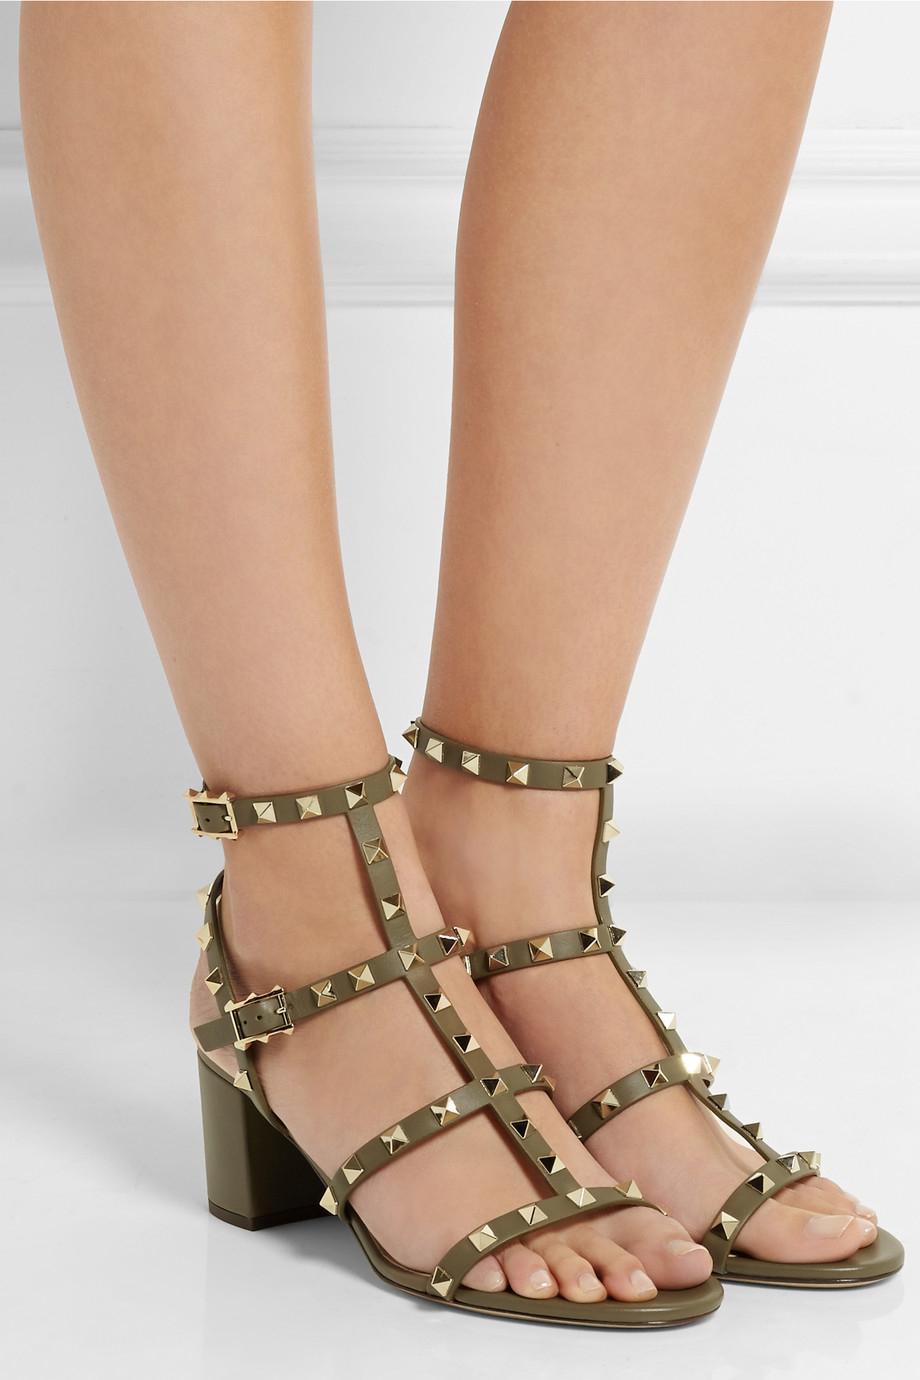 Cheap Valentino Shoes Uk